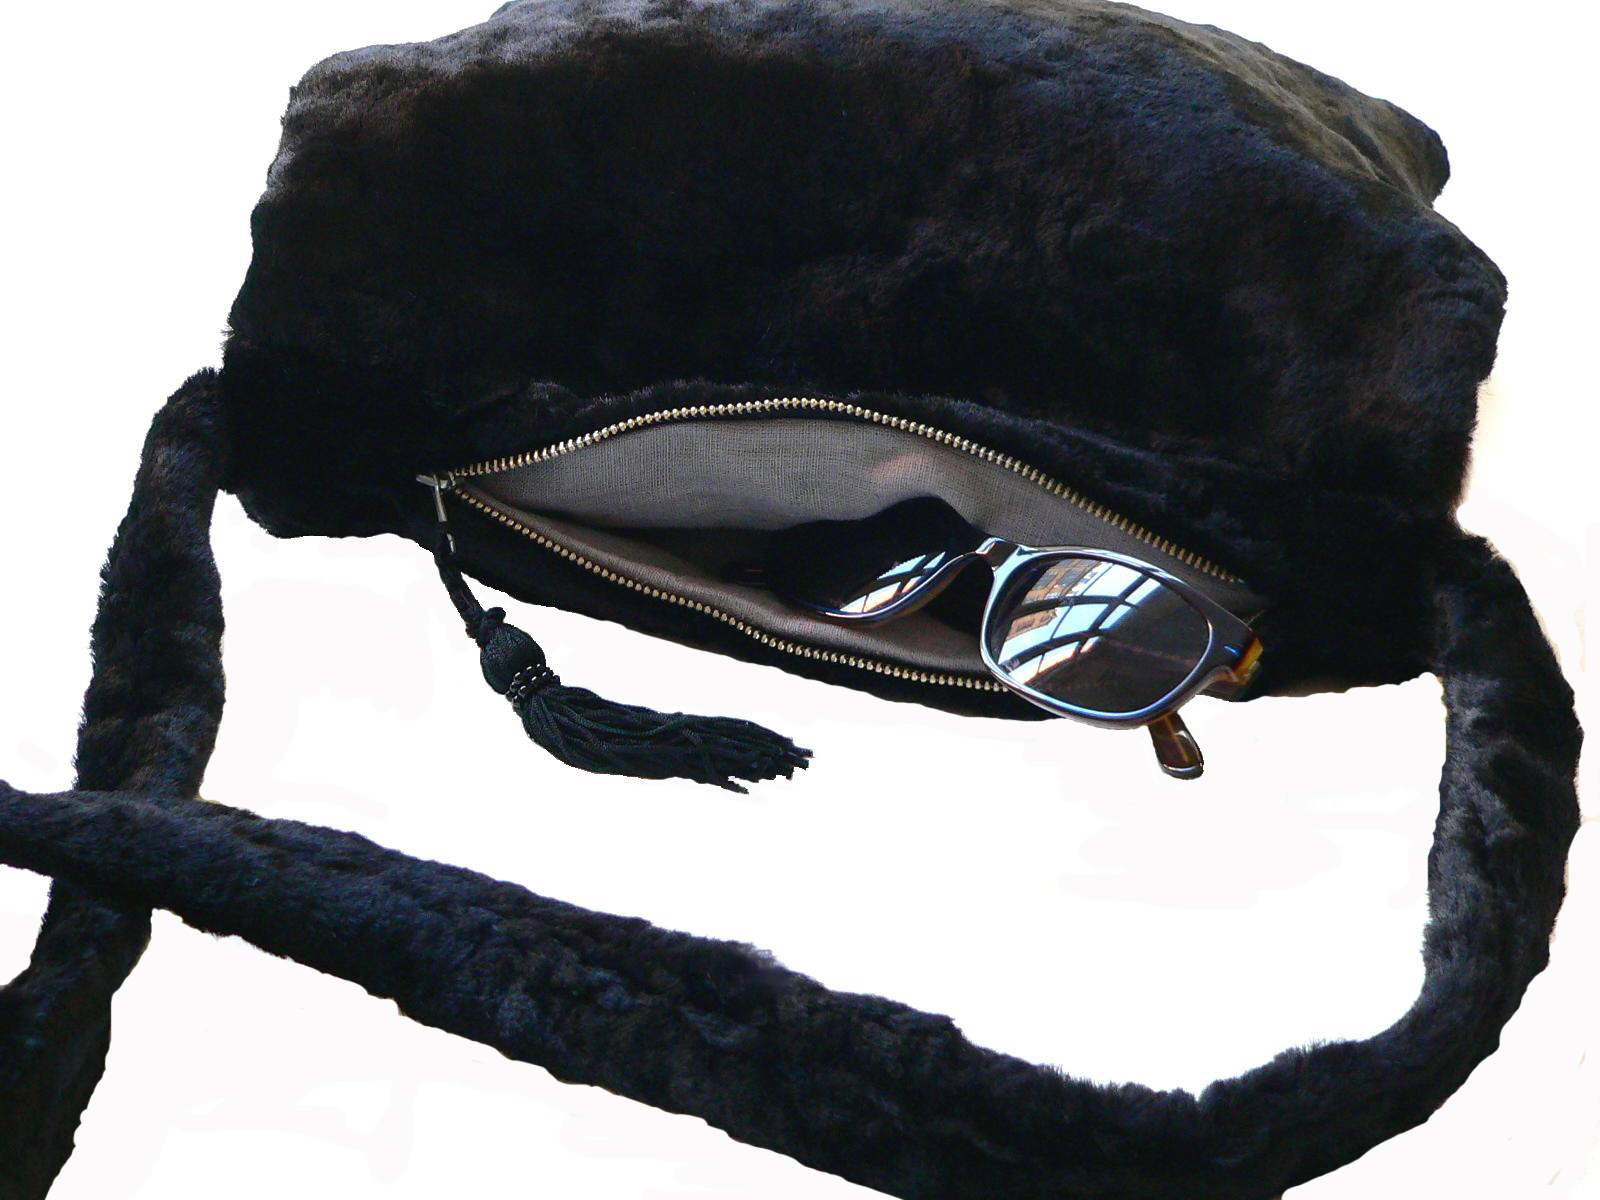 Muff-schwarz-Kunstfell